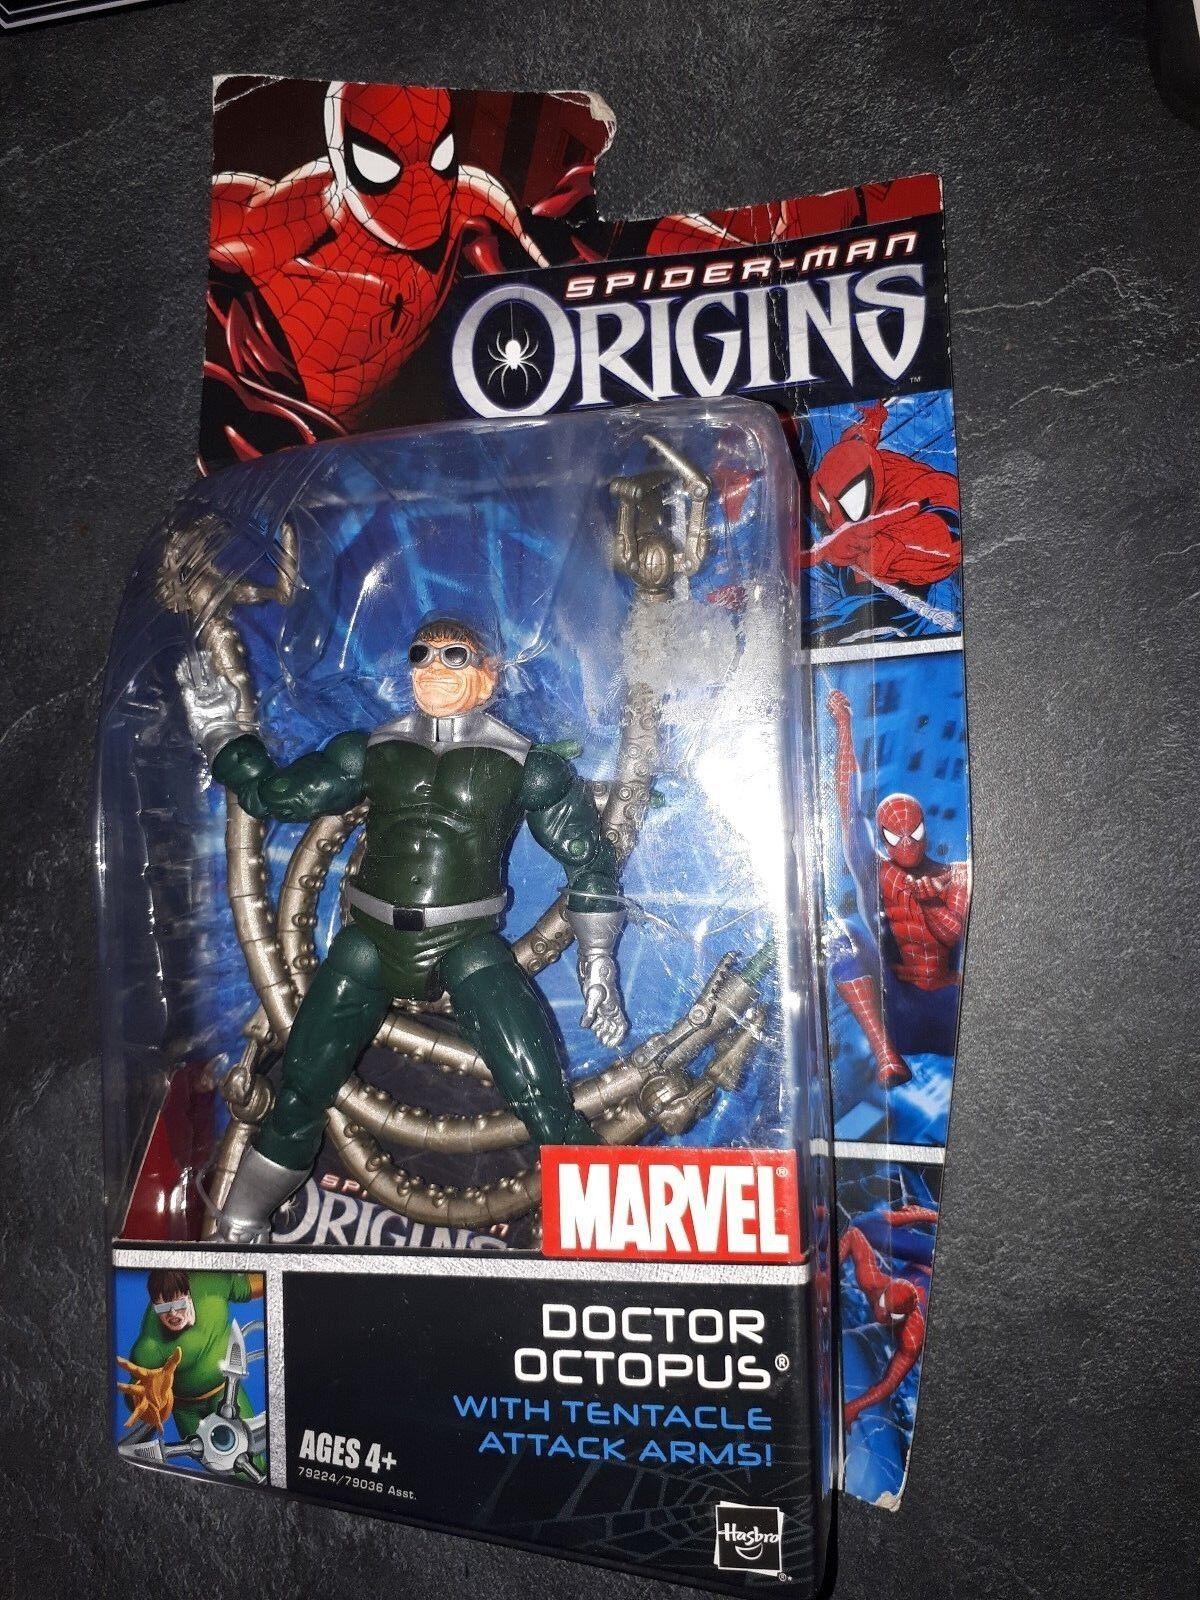 Figurine Spiderman Origins Doctor Octopus Hasbro 2006 vintage with box rare